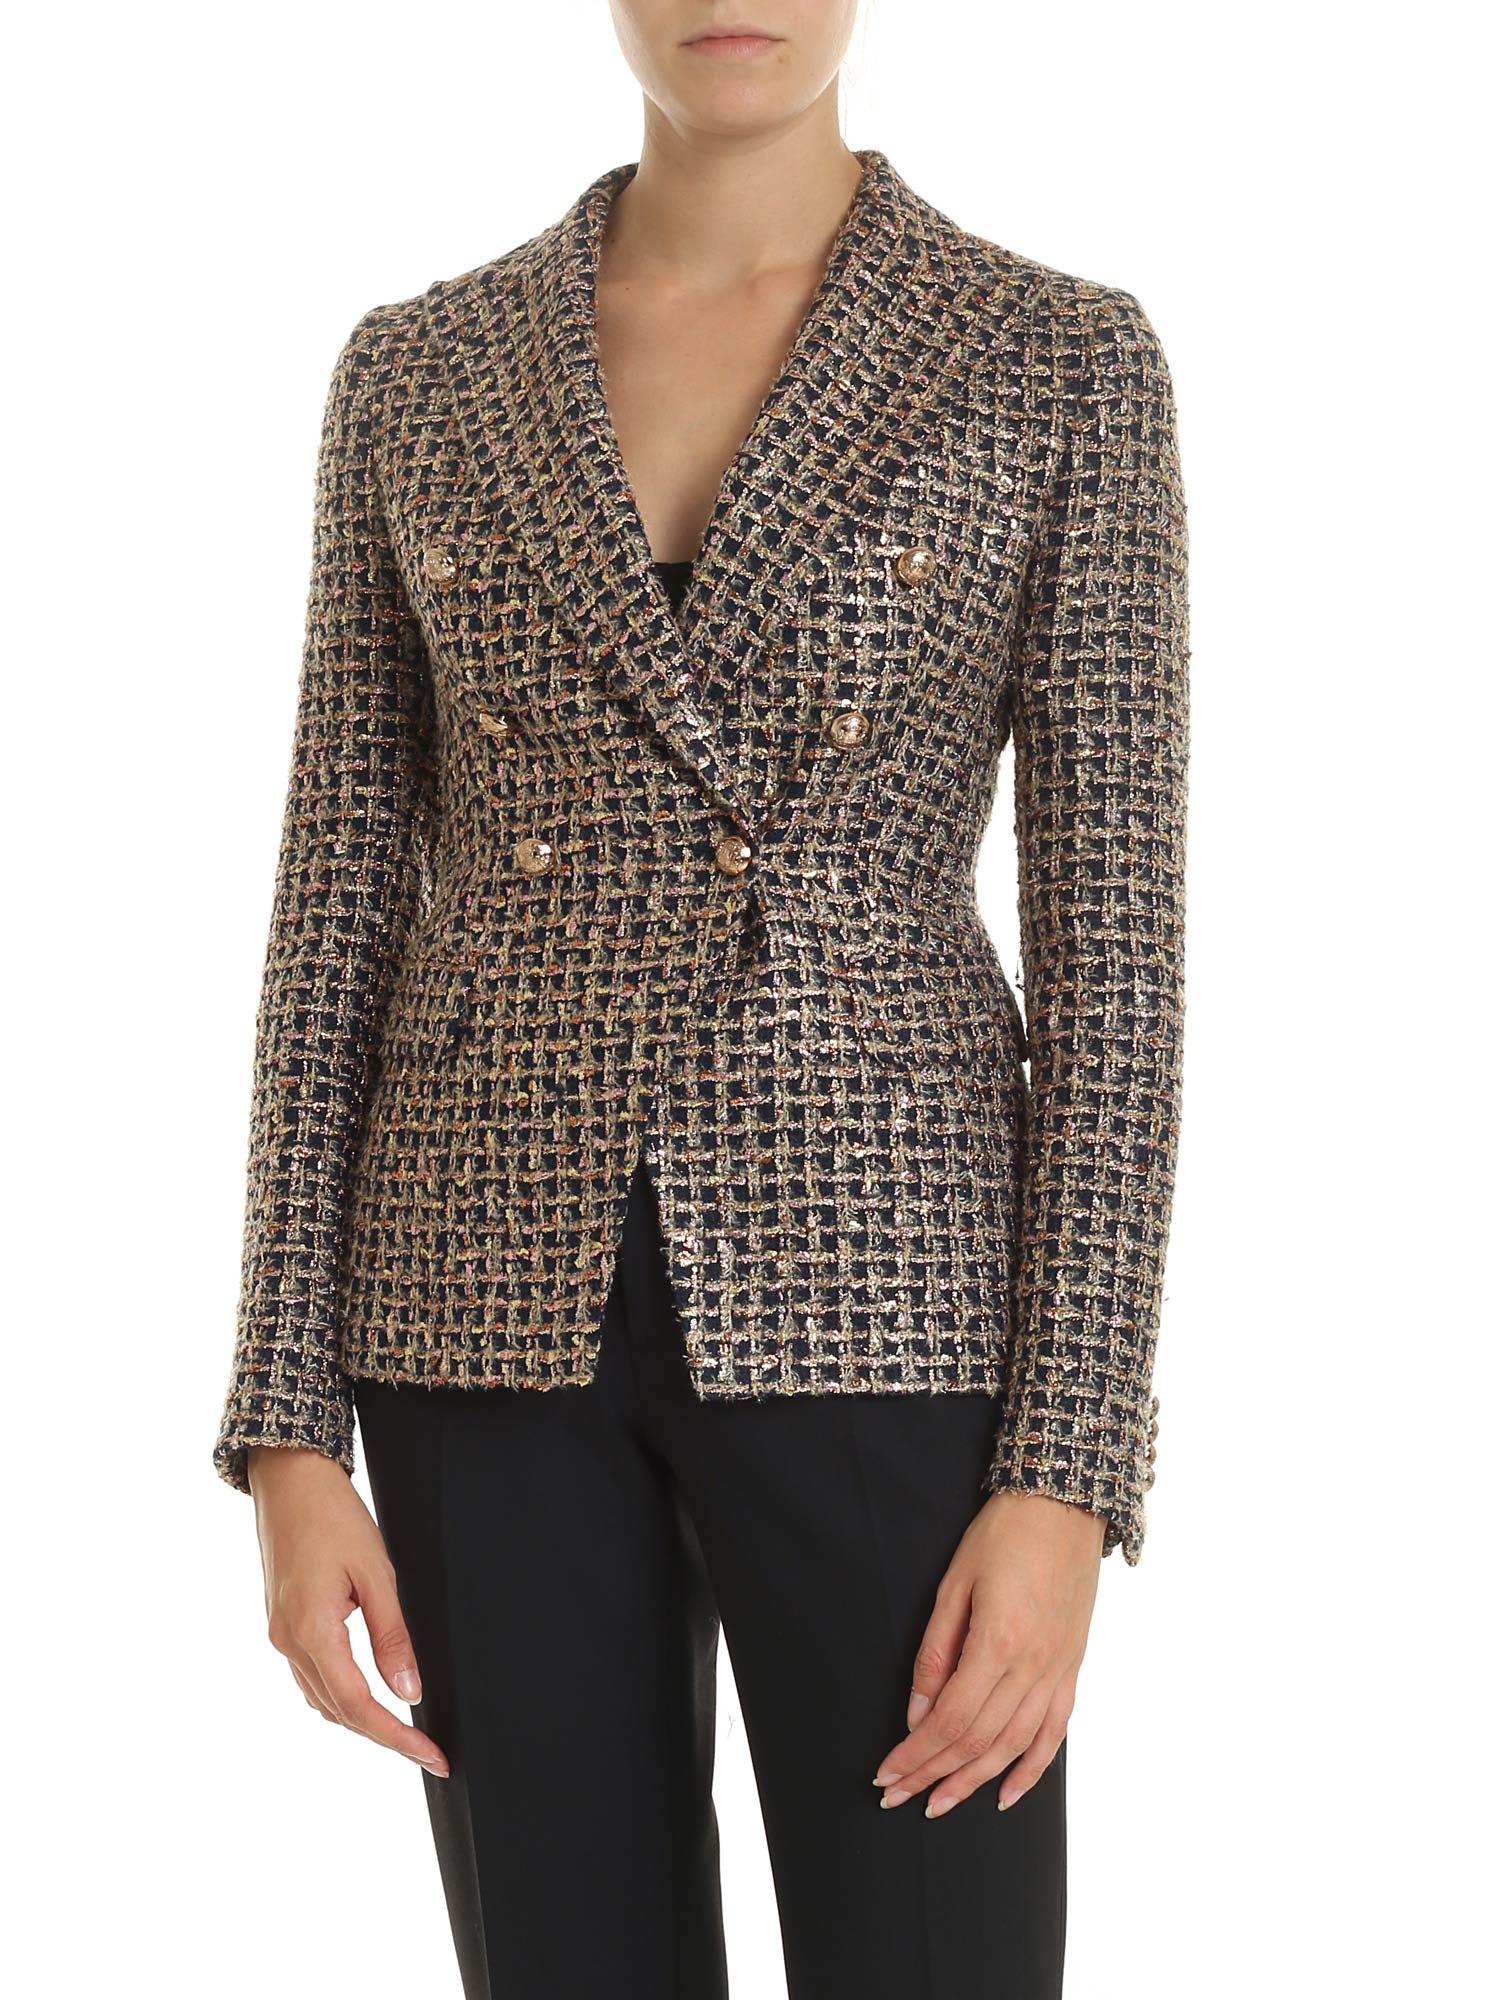 Tagliatore – Bouclé Jacket With Laminated Pattern